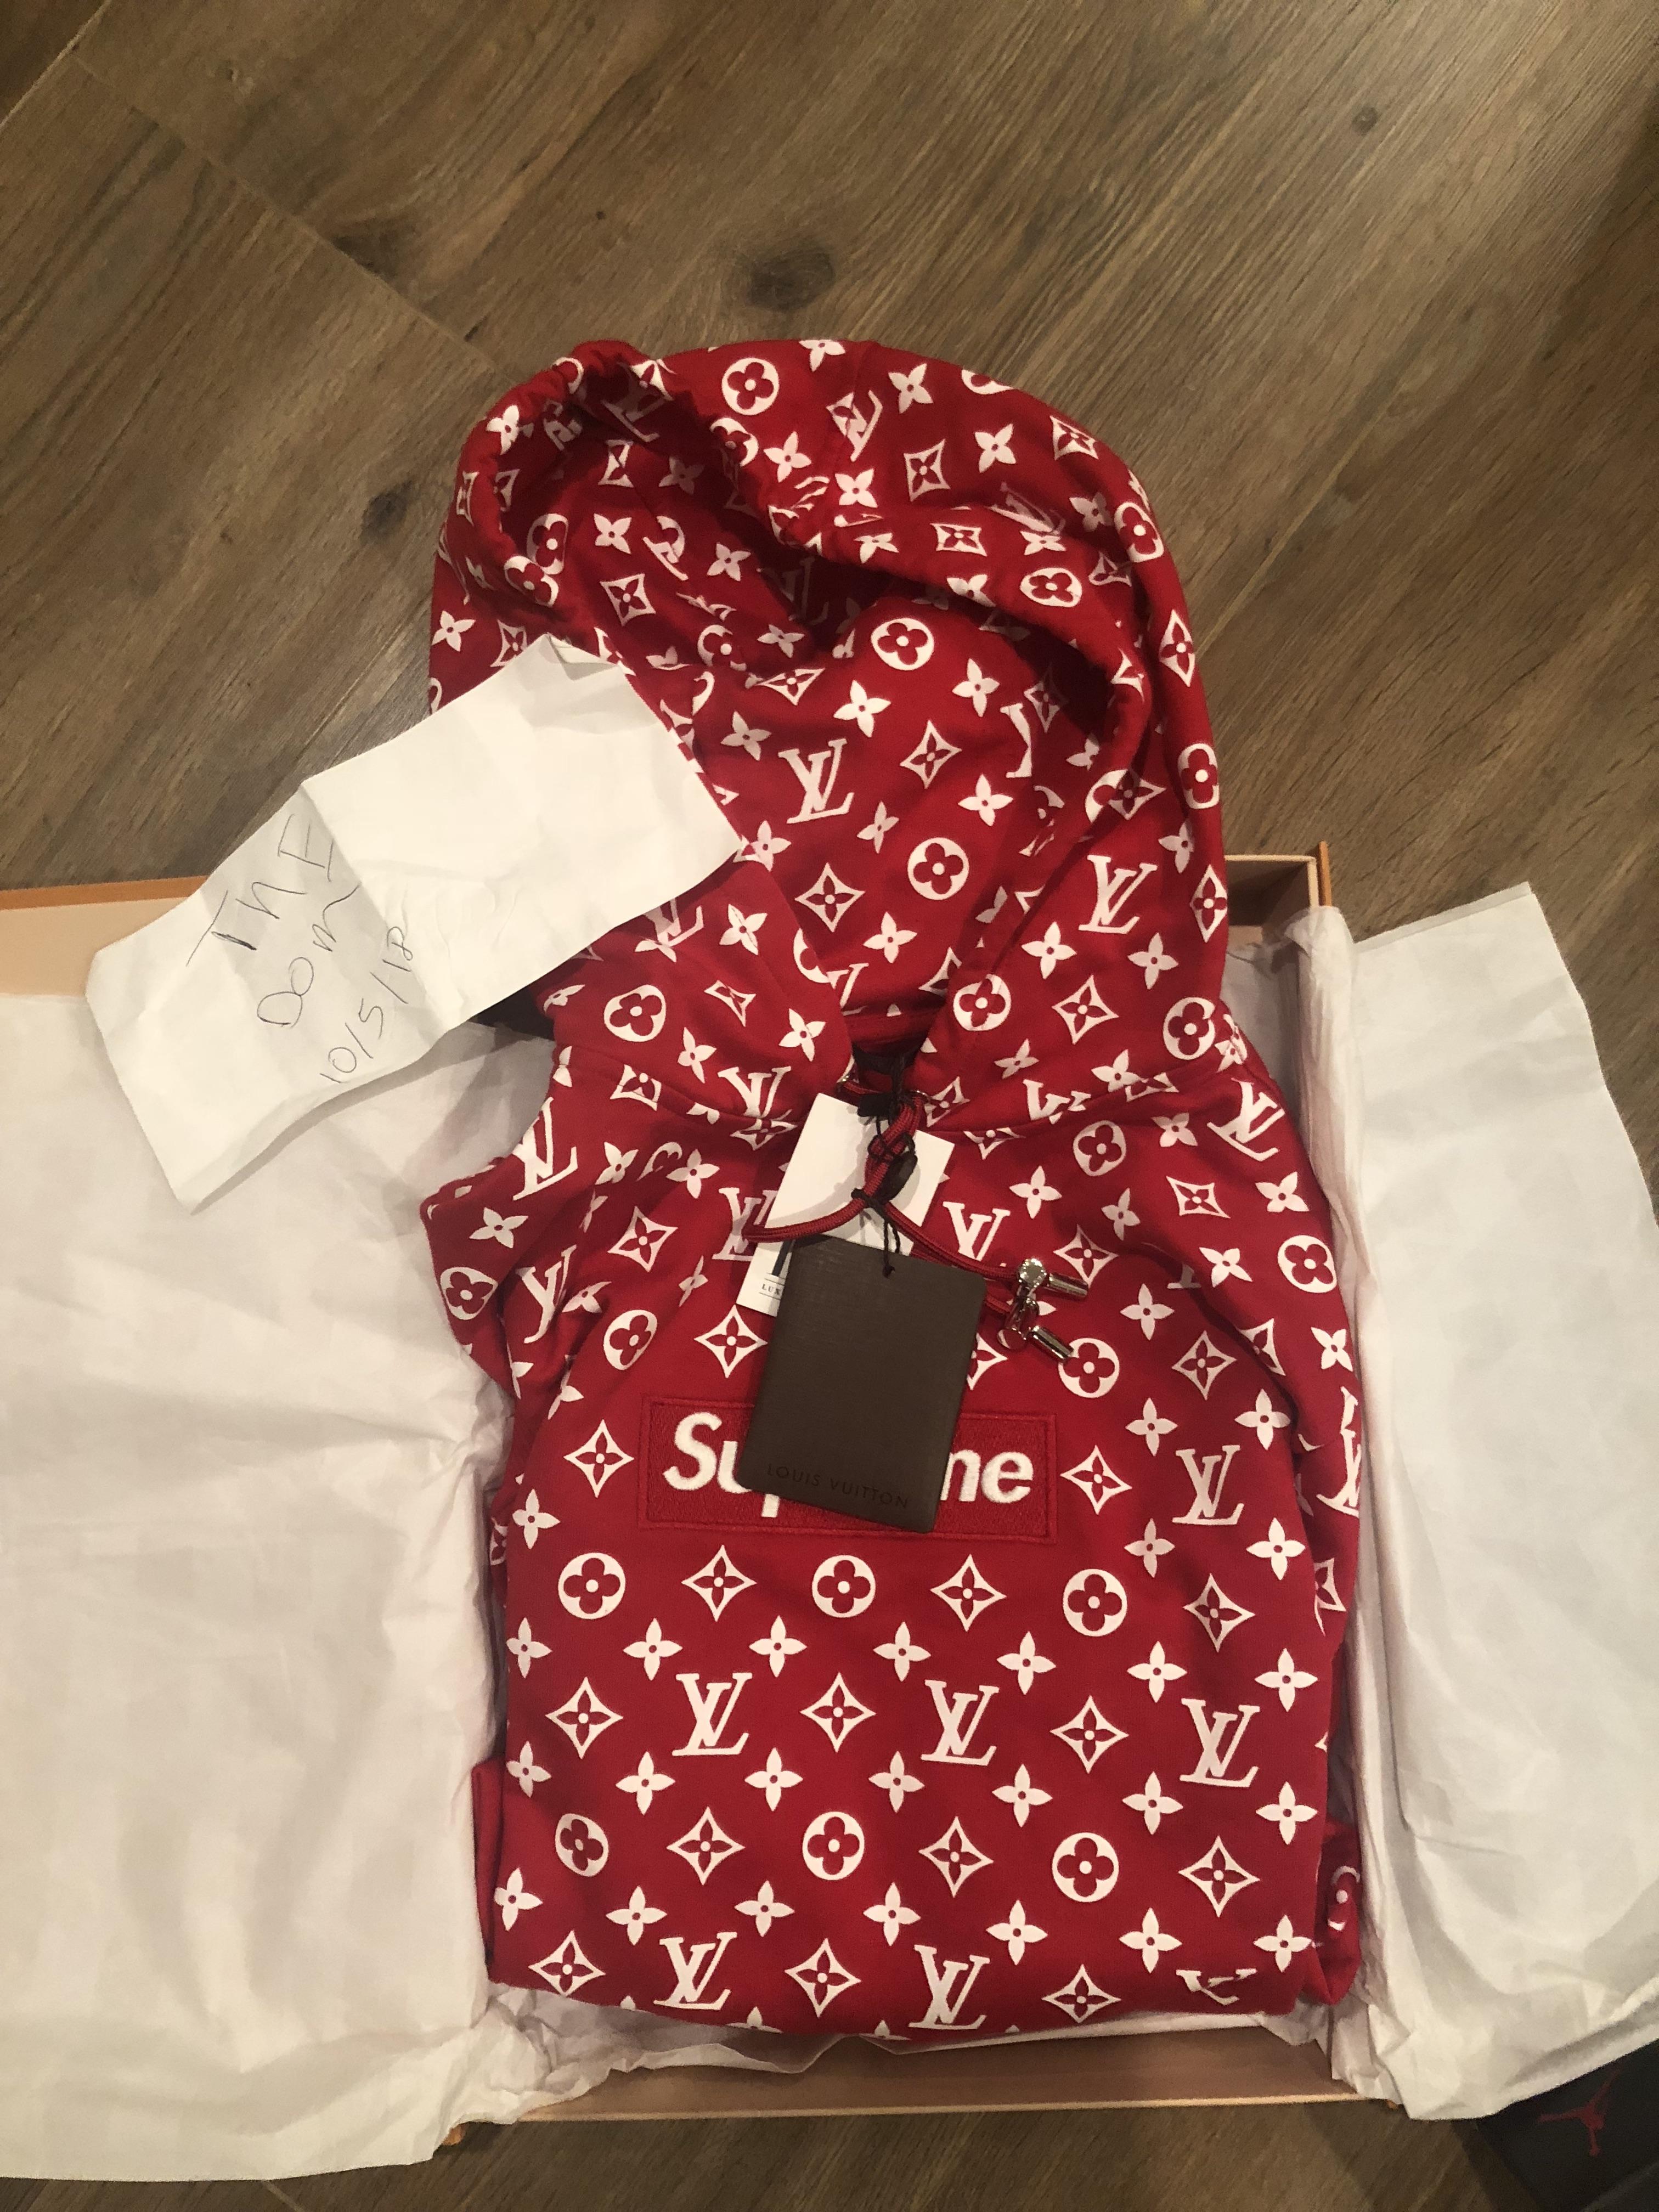 caa74875919 Supreme Louis Vuitton Red Monogram Box Logo Hoodie